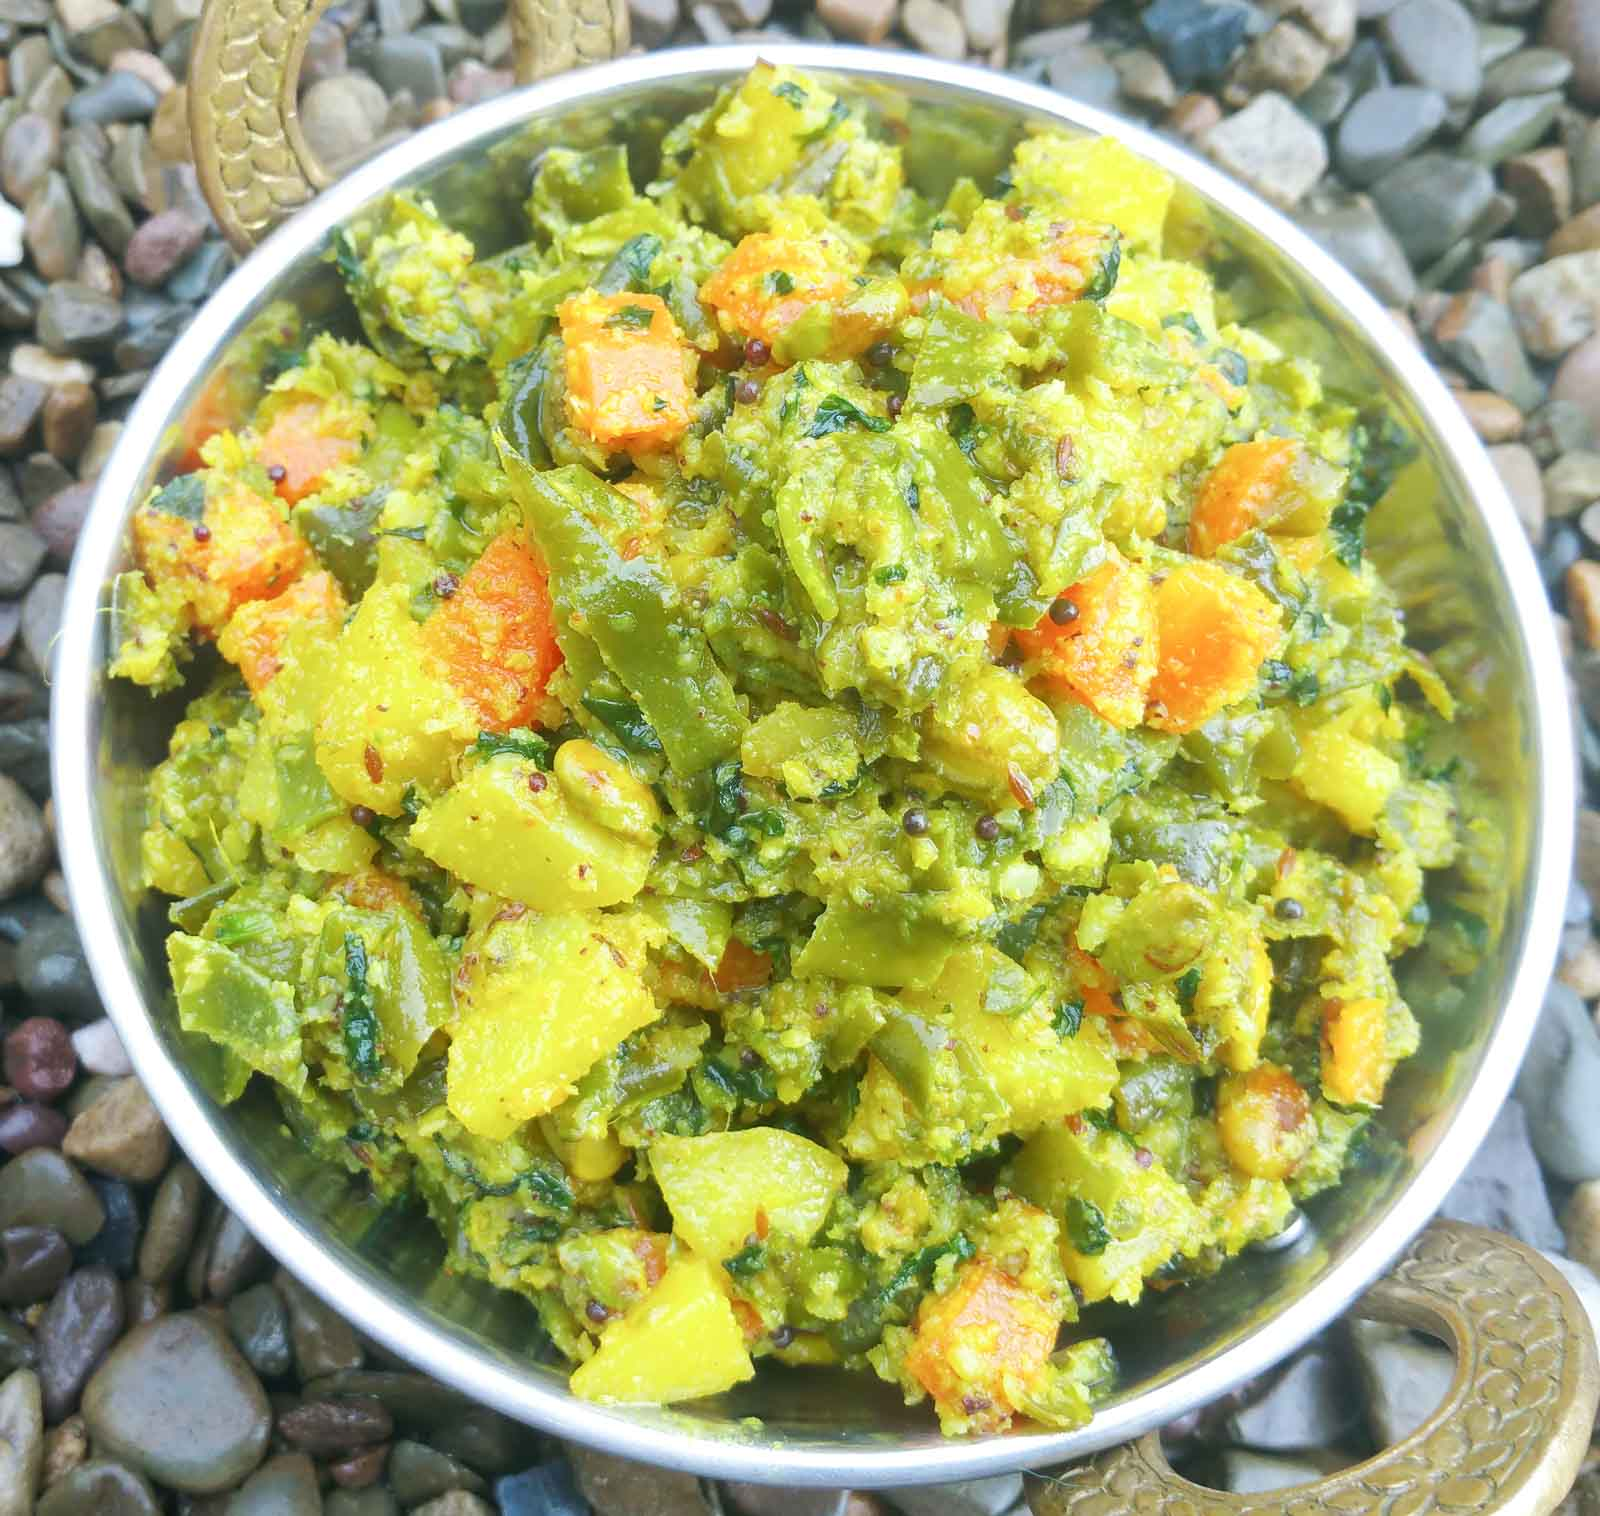 Mixed Vegetable Koora Recipe - Mixed Vegetable Poriyal